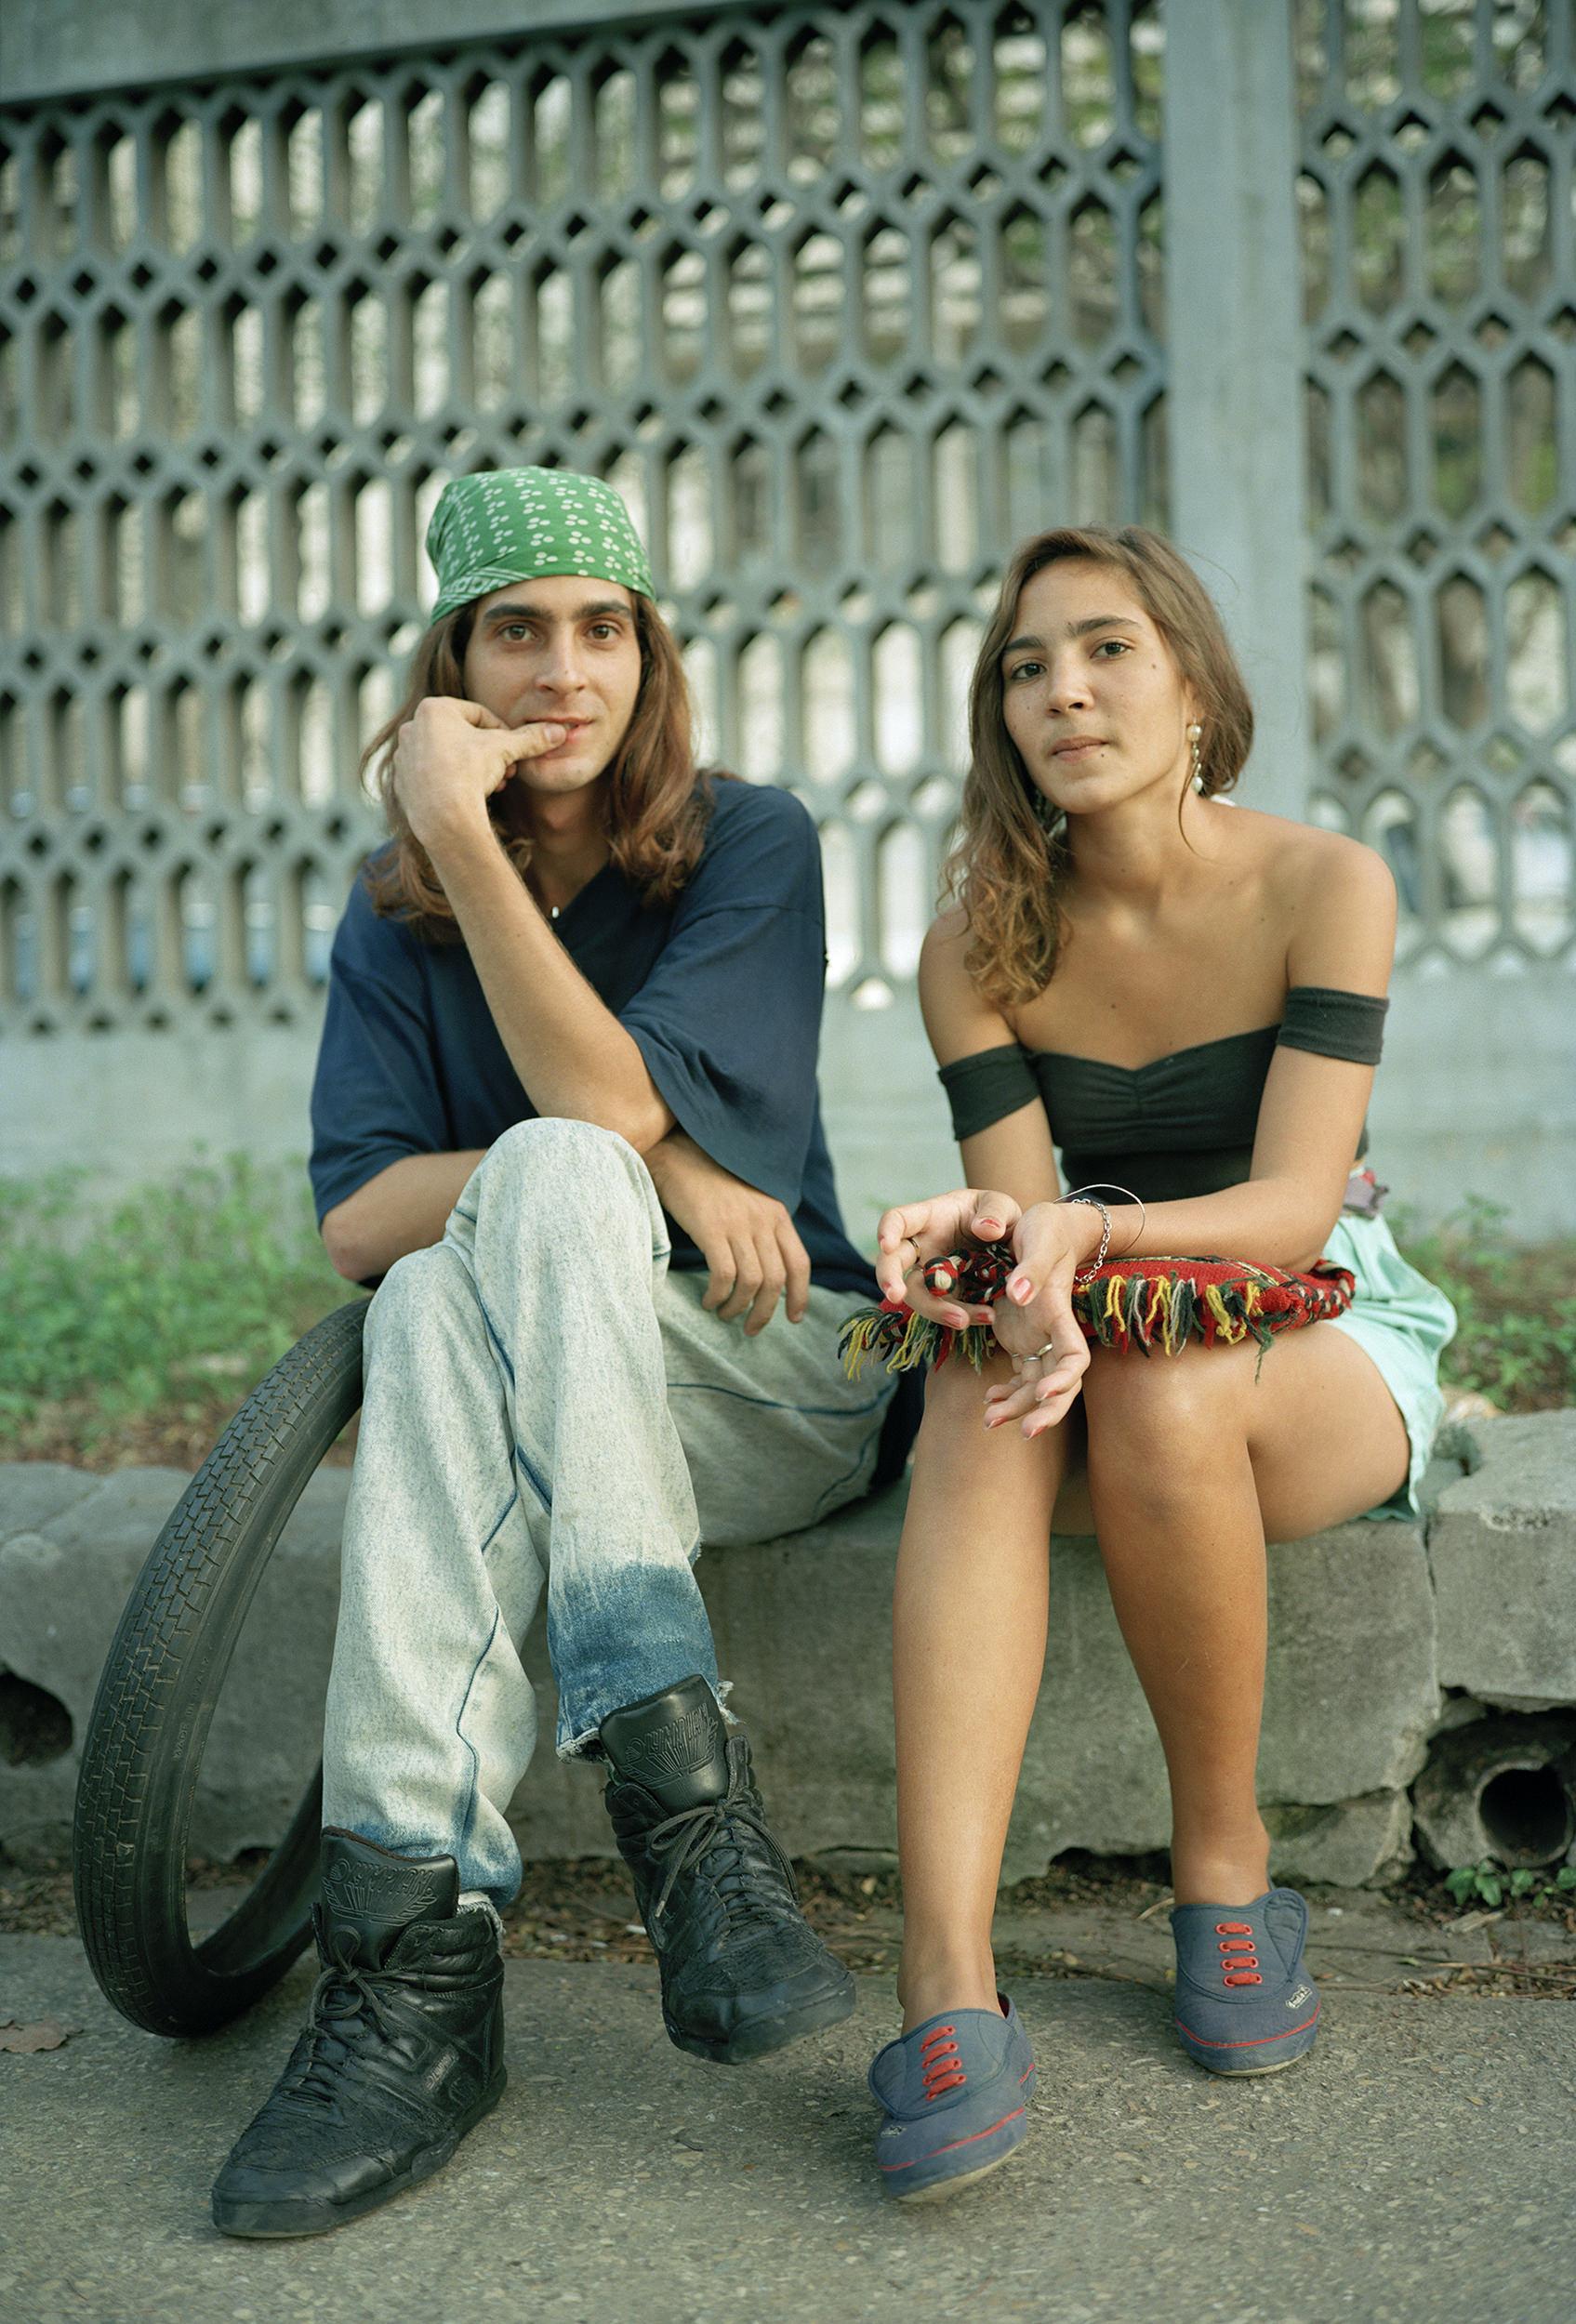 Couple With Tire-Havana, Cuba